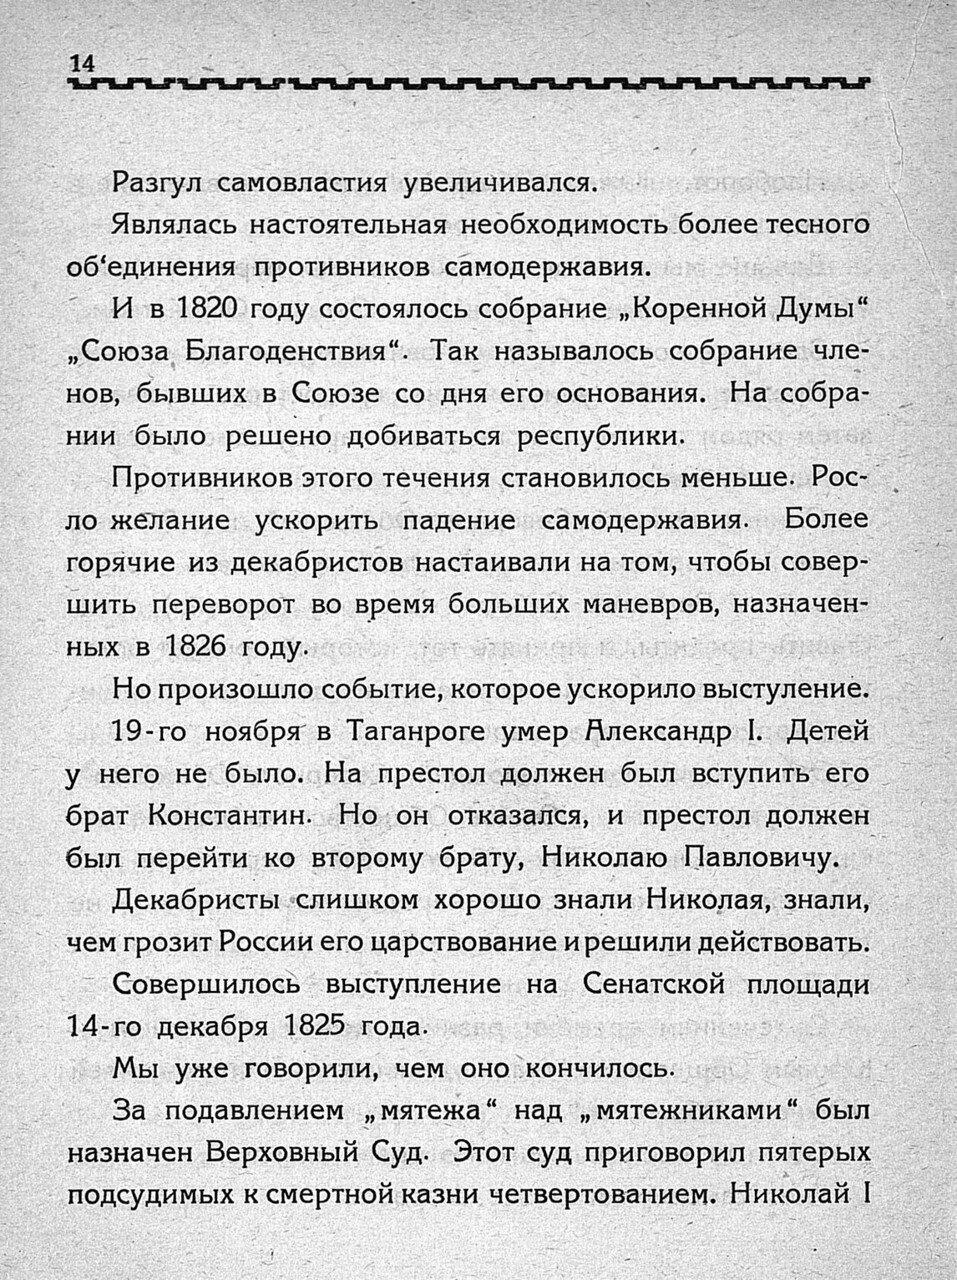 https://img-fotki.yandex.ru/get/60682/199368979.23/0_1bfad2_877aeca8_XXXL.jpg